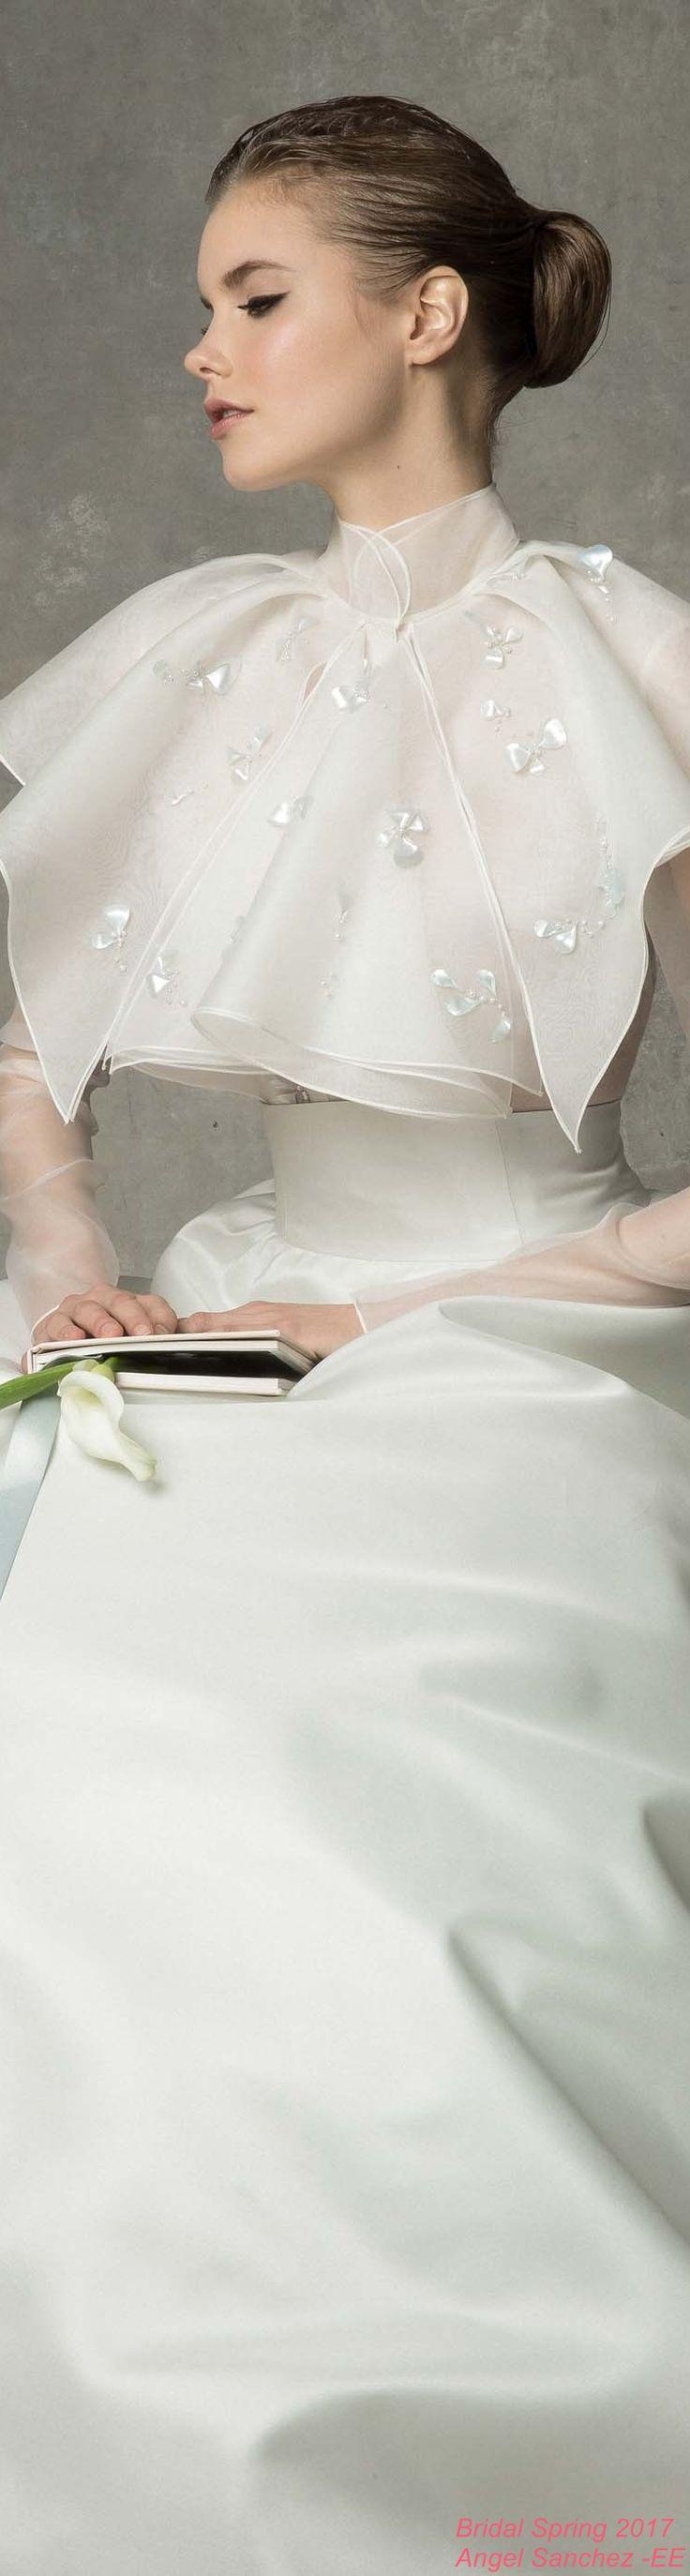 Ginger zee wedding dress   best We love weddings images on Pinterest  Bridal gowns